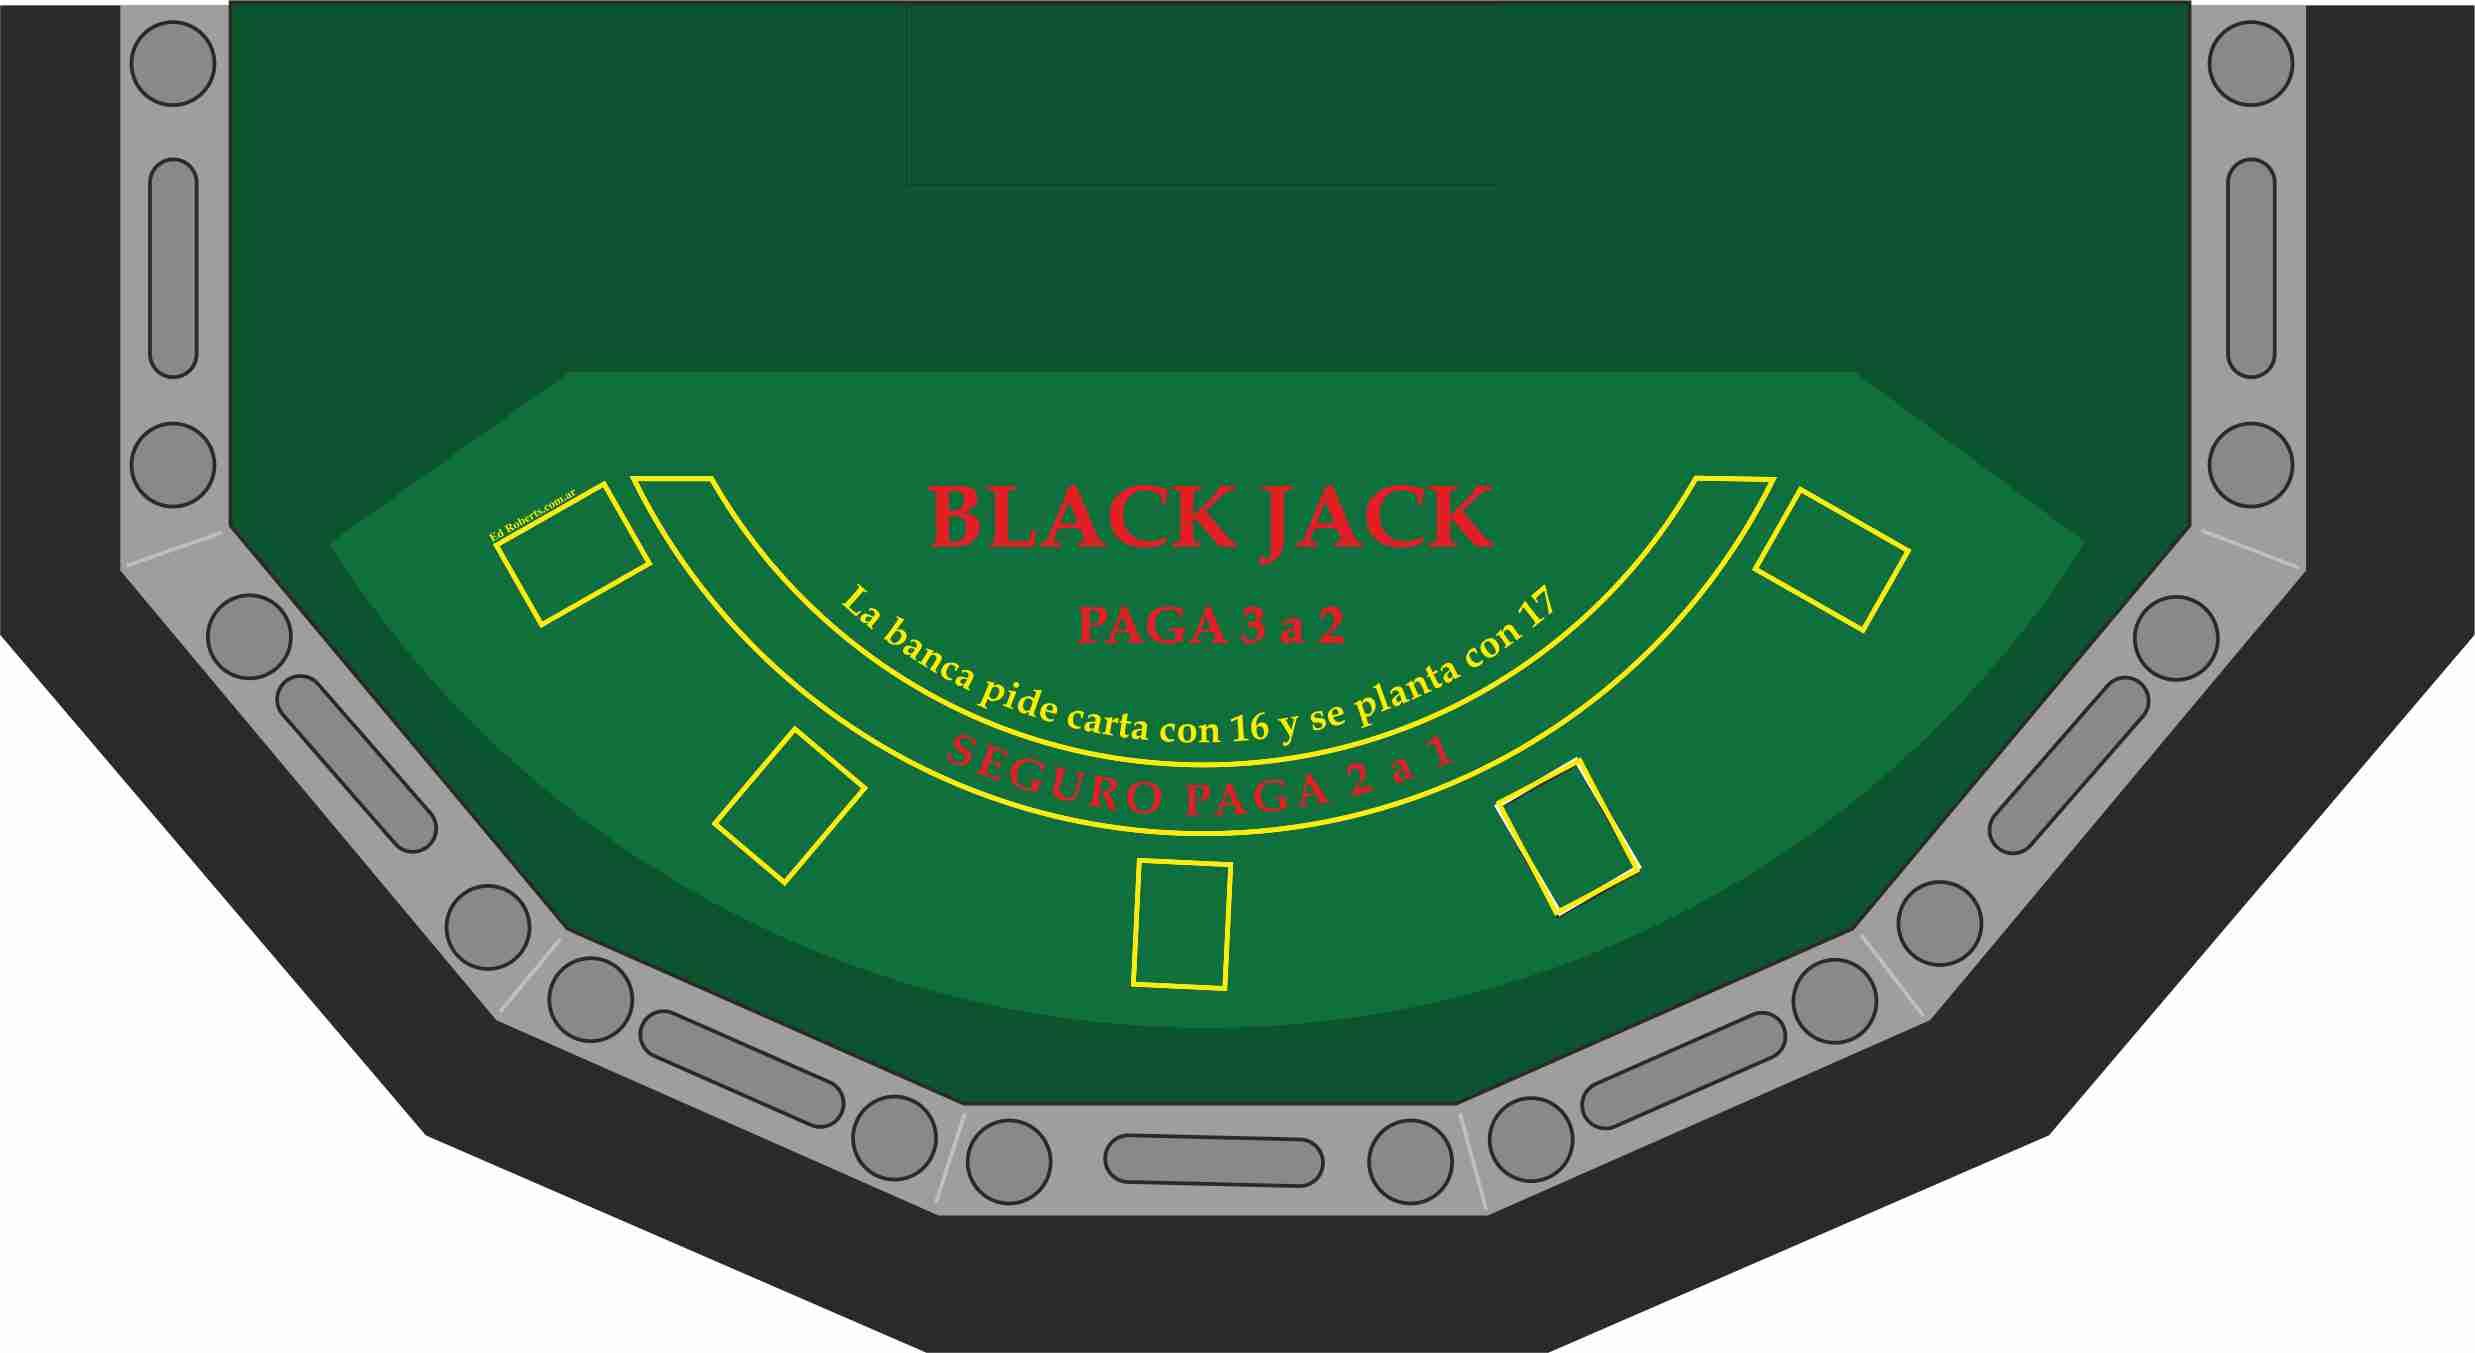 Black Jack 5 jugadores